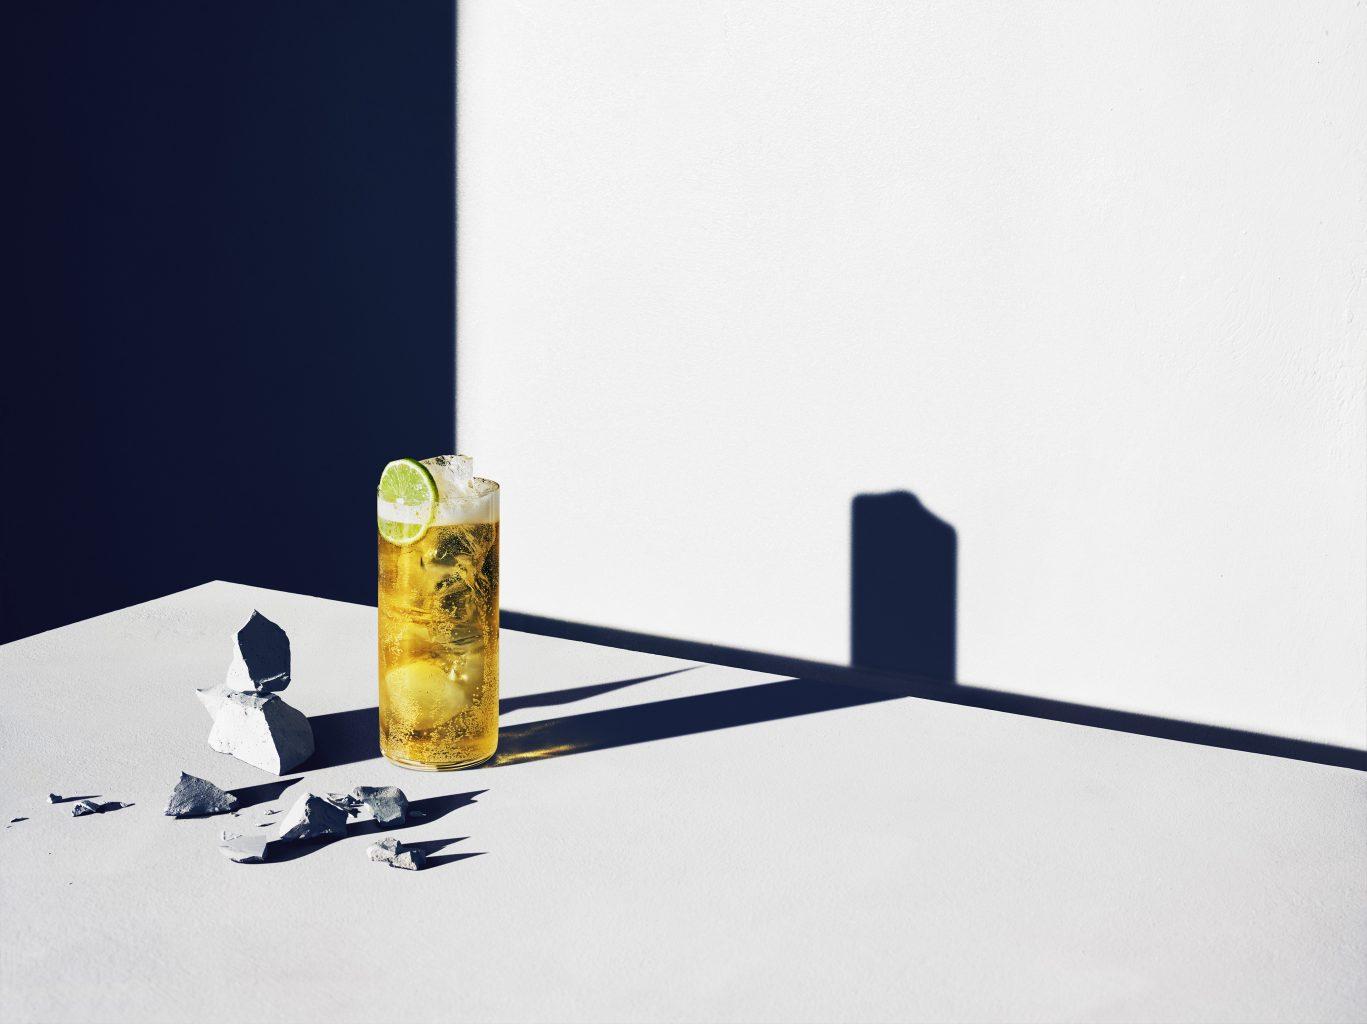 062 S1 Lifestyle w1b   Equiano Rum